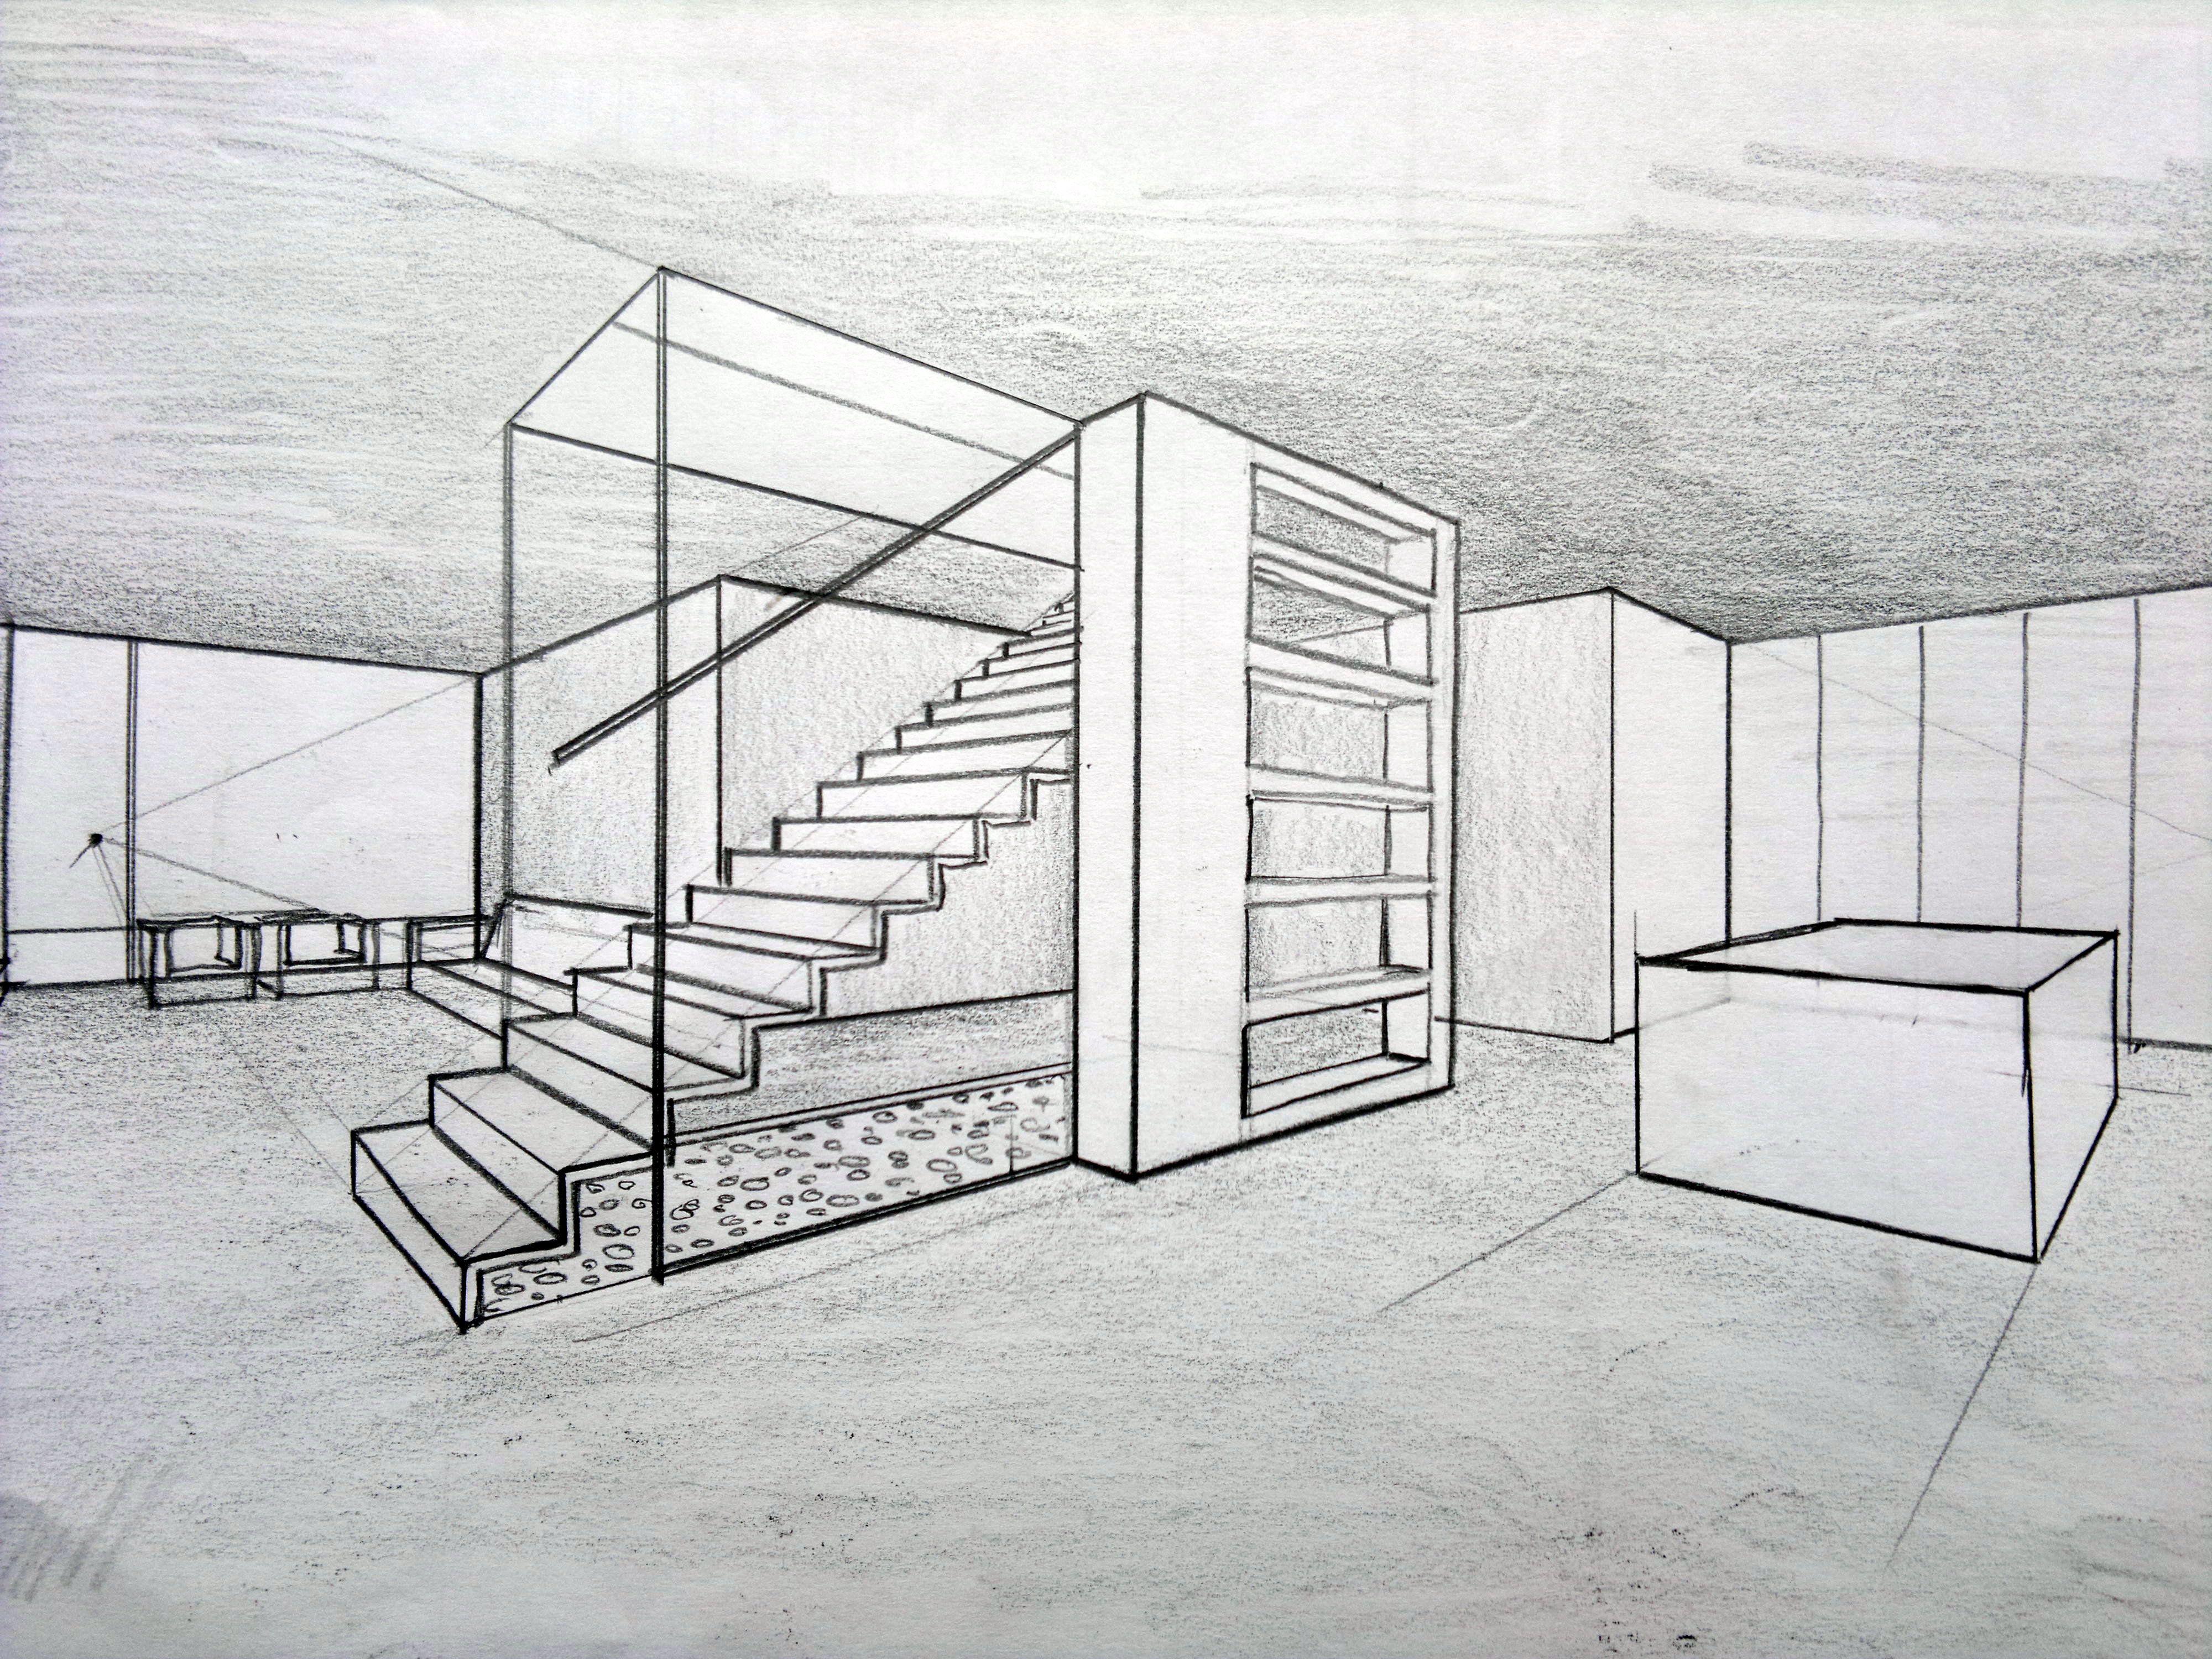 Escalera Moderna Bocetos Arquitectura Dibujo De Arquitectura Diseno Arquitectonico